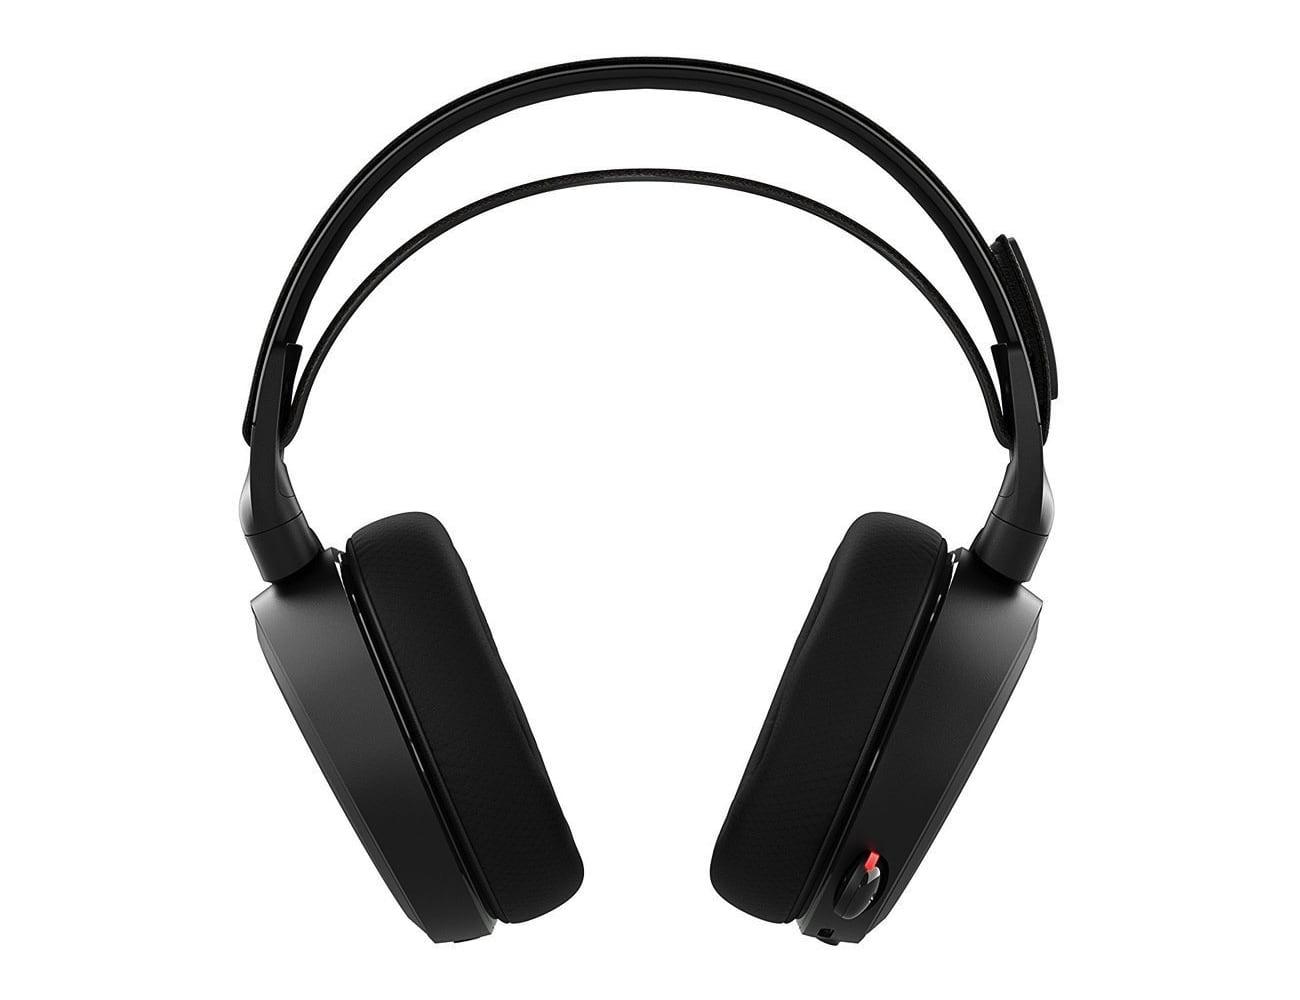 SteelSeries Arctis 7 Lag-Free Wireless Gaming Headset